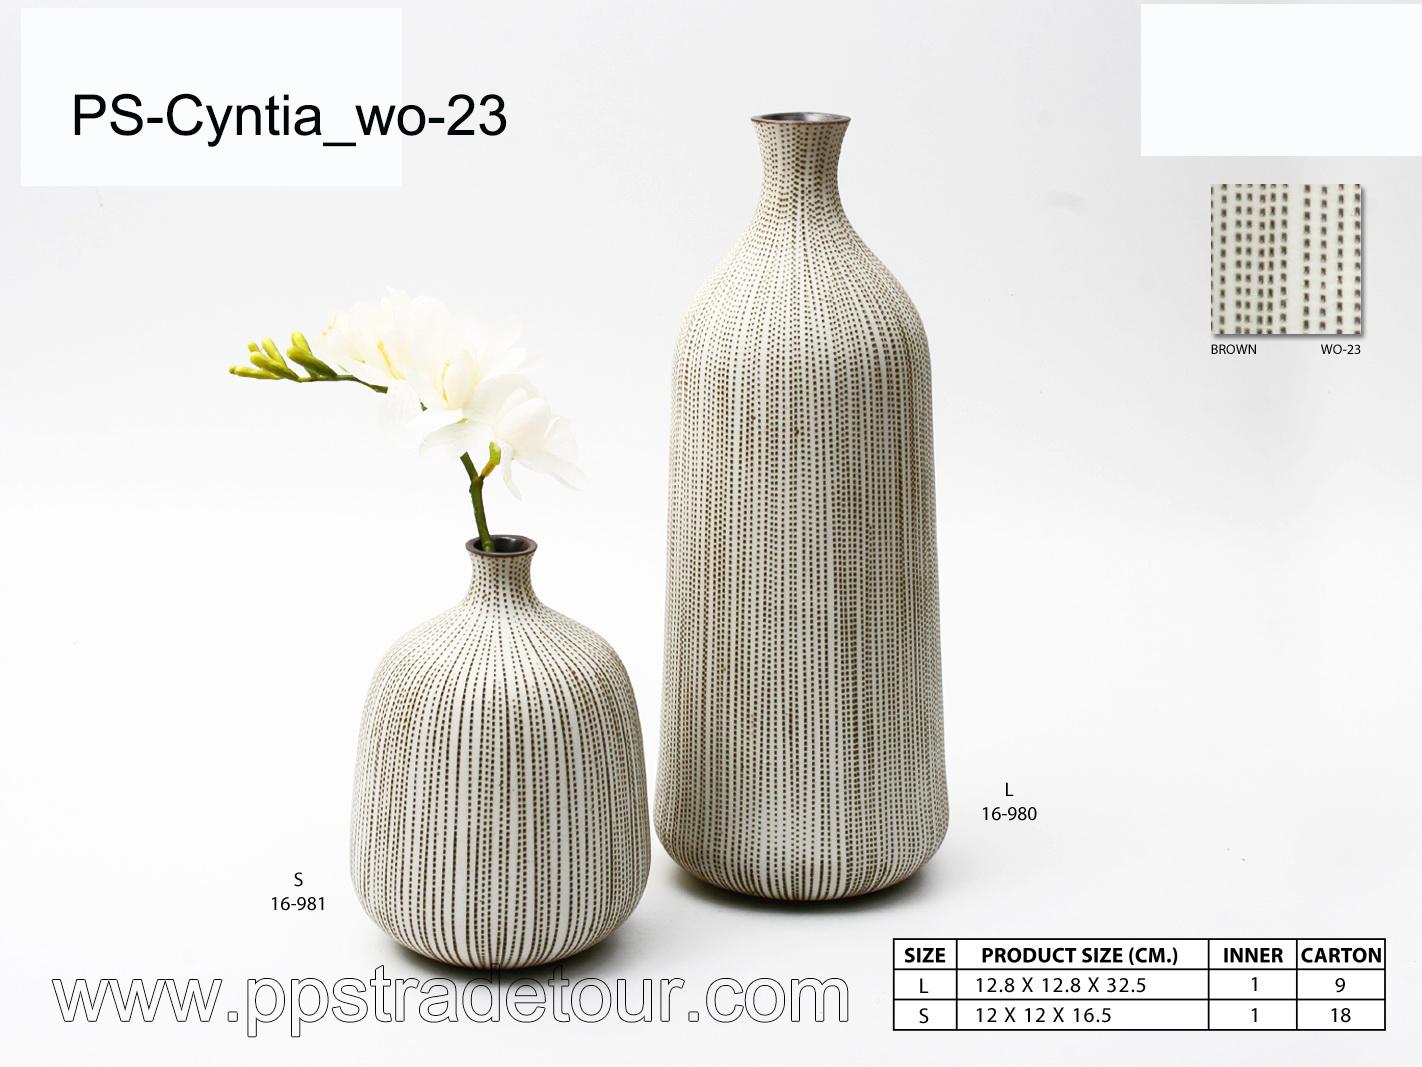 PSCV-Cyntia_wo-23